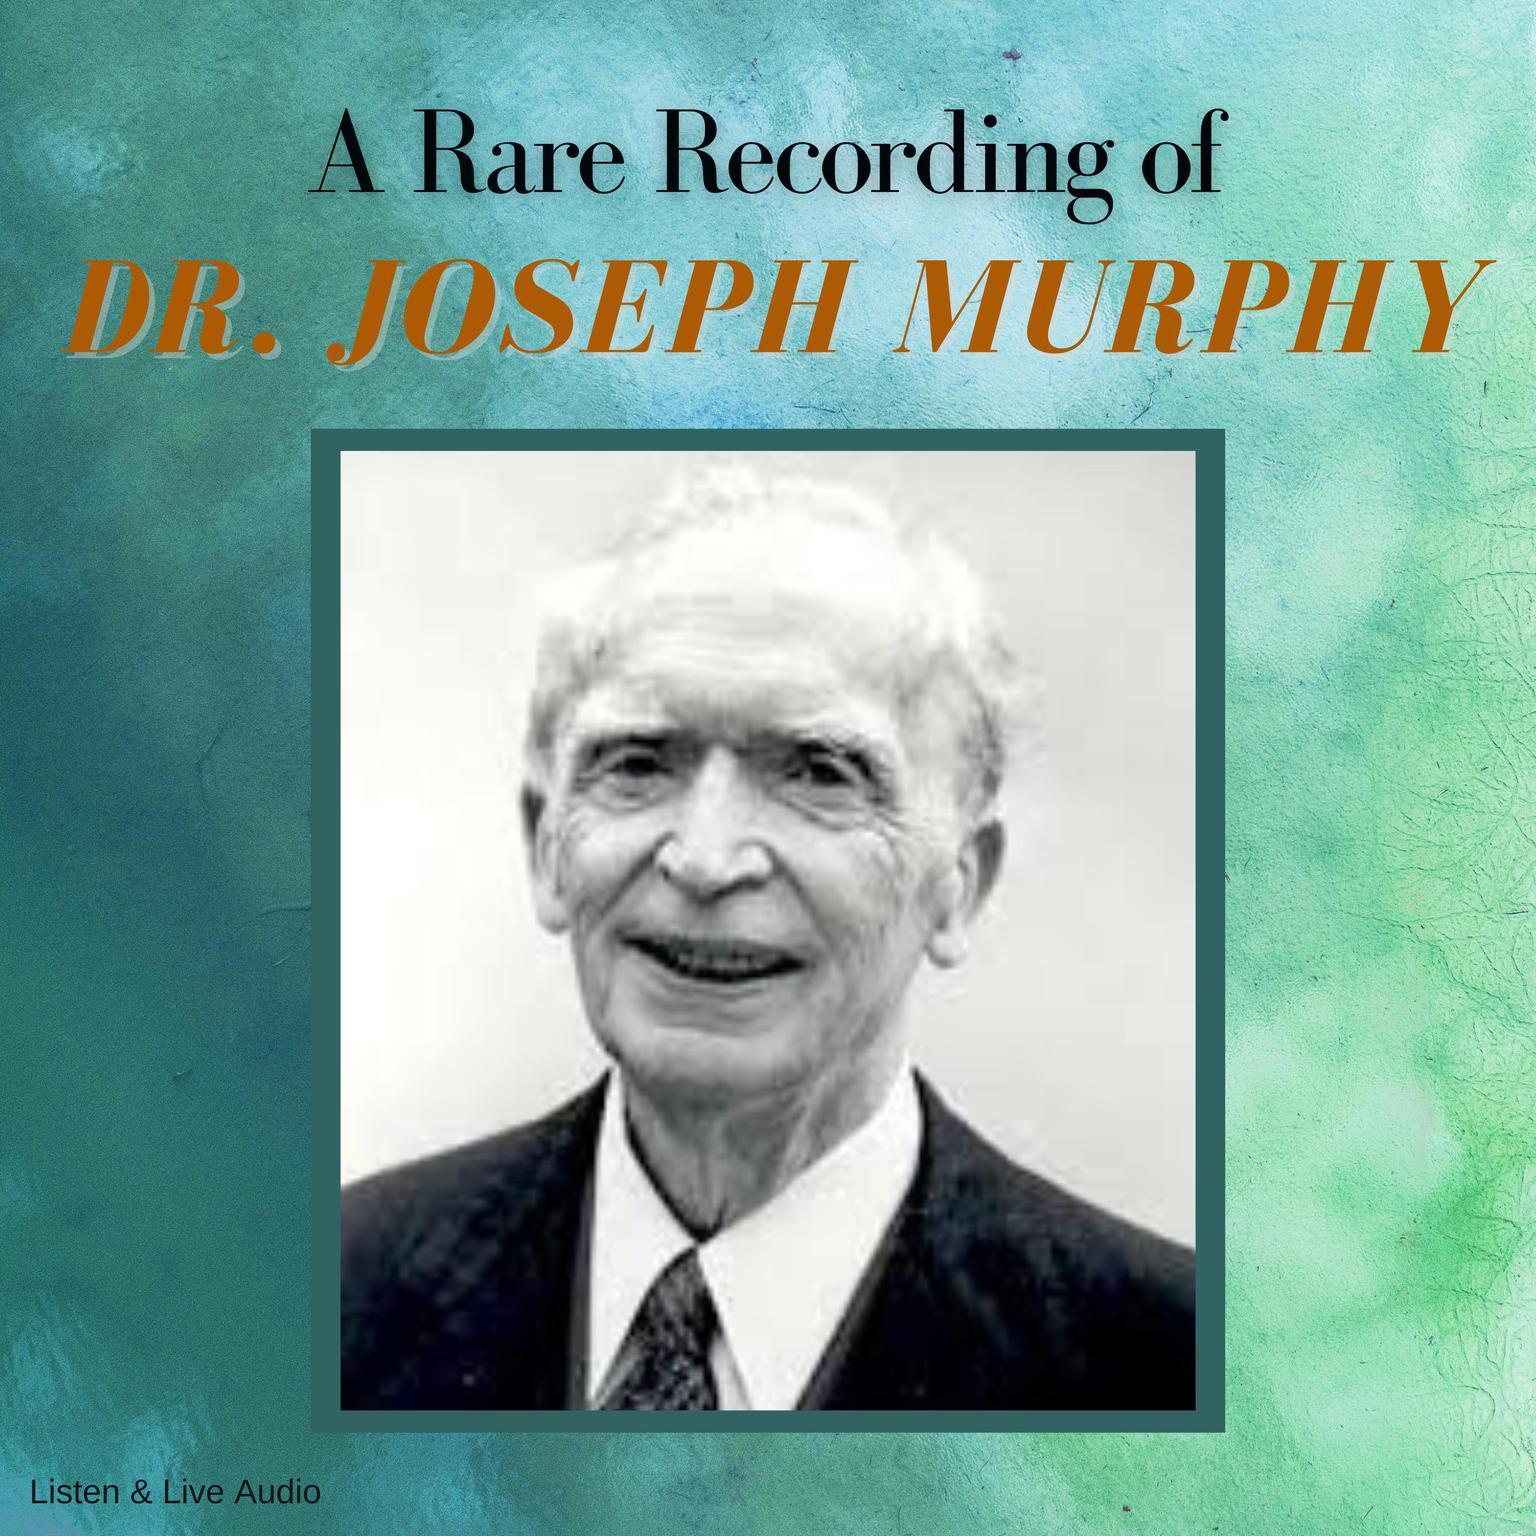 A Rare Recording of Dr. Joseph Murphy Audiobook, by Joseph Murphy